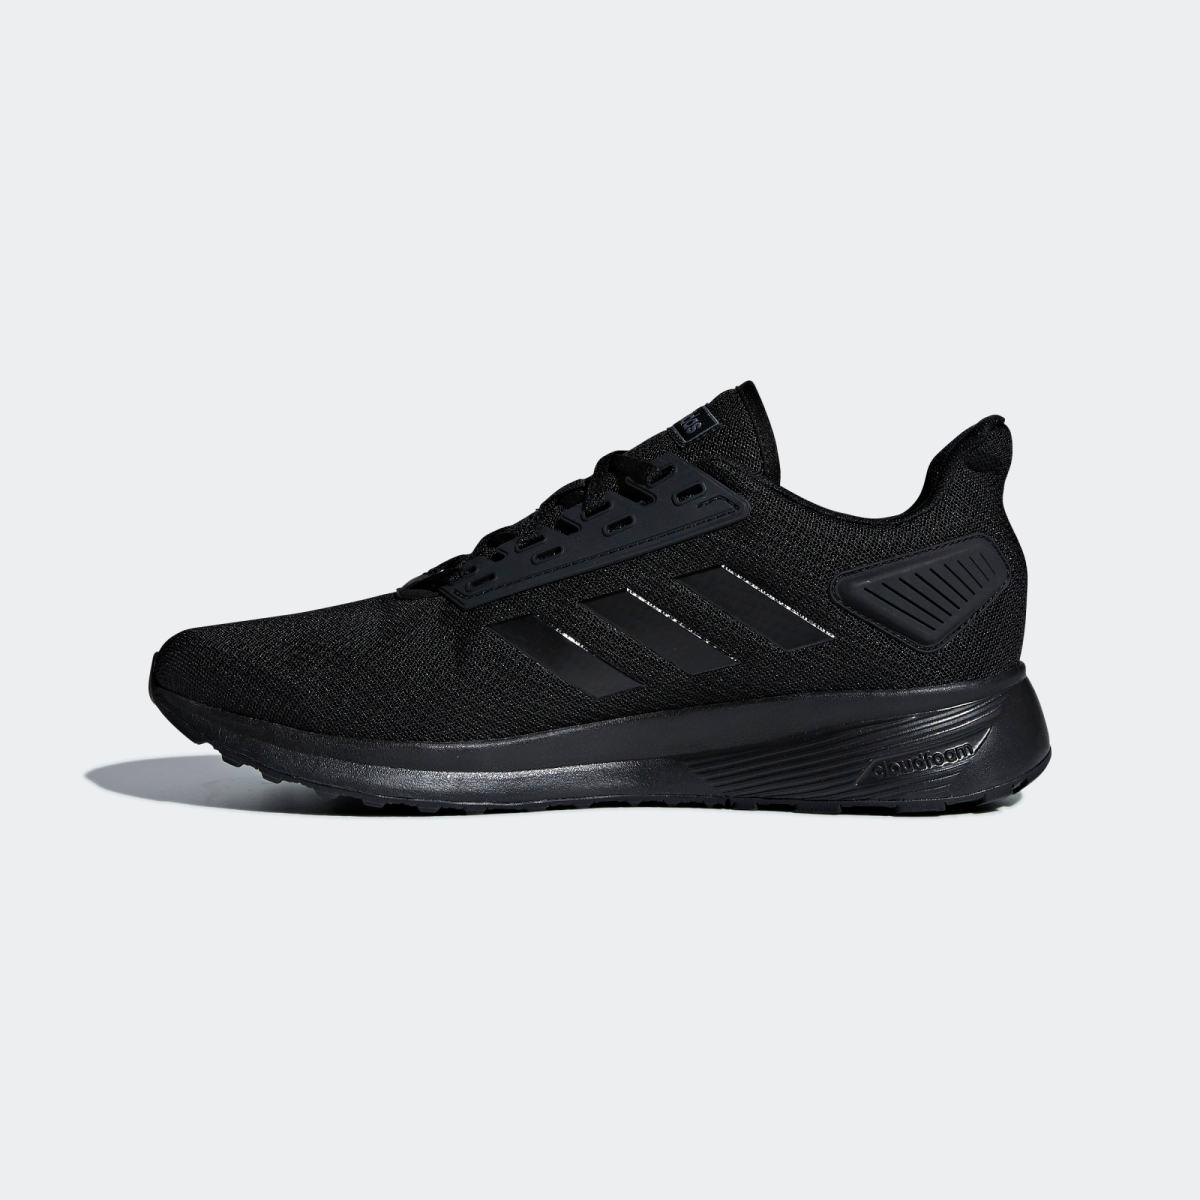 Duramo_9_Shoes_Black_B96578_06_standard